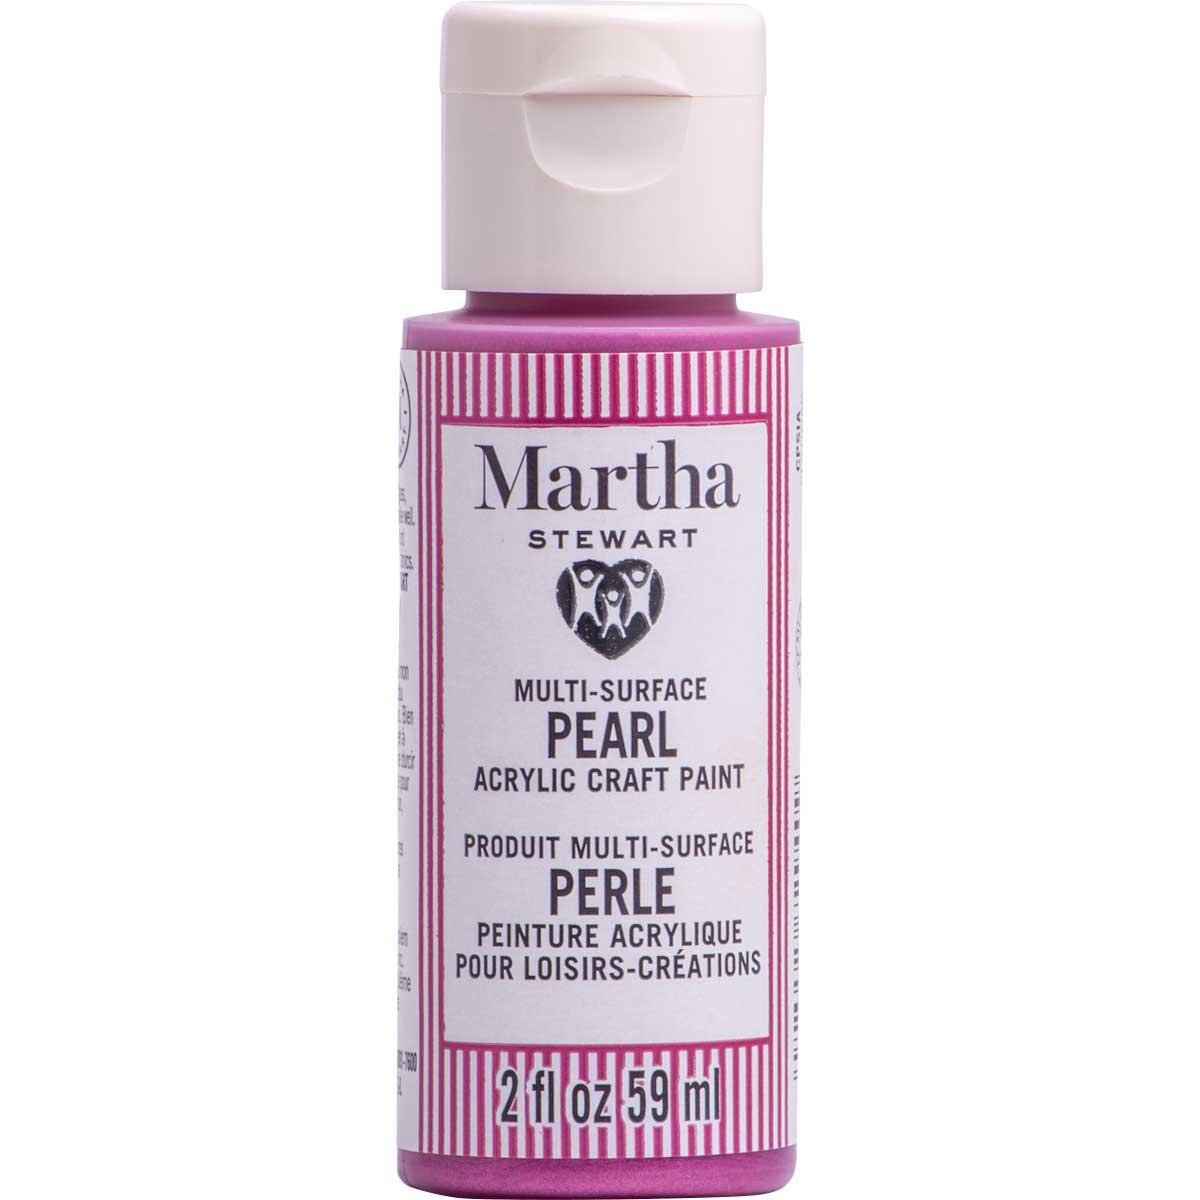 Martha Stewart® 2oz Multi-Surface Pearl Acrylic Craft Paint - Wisteria